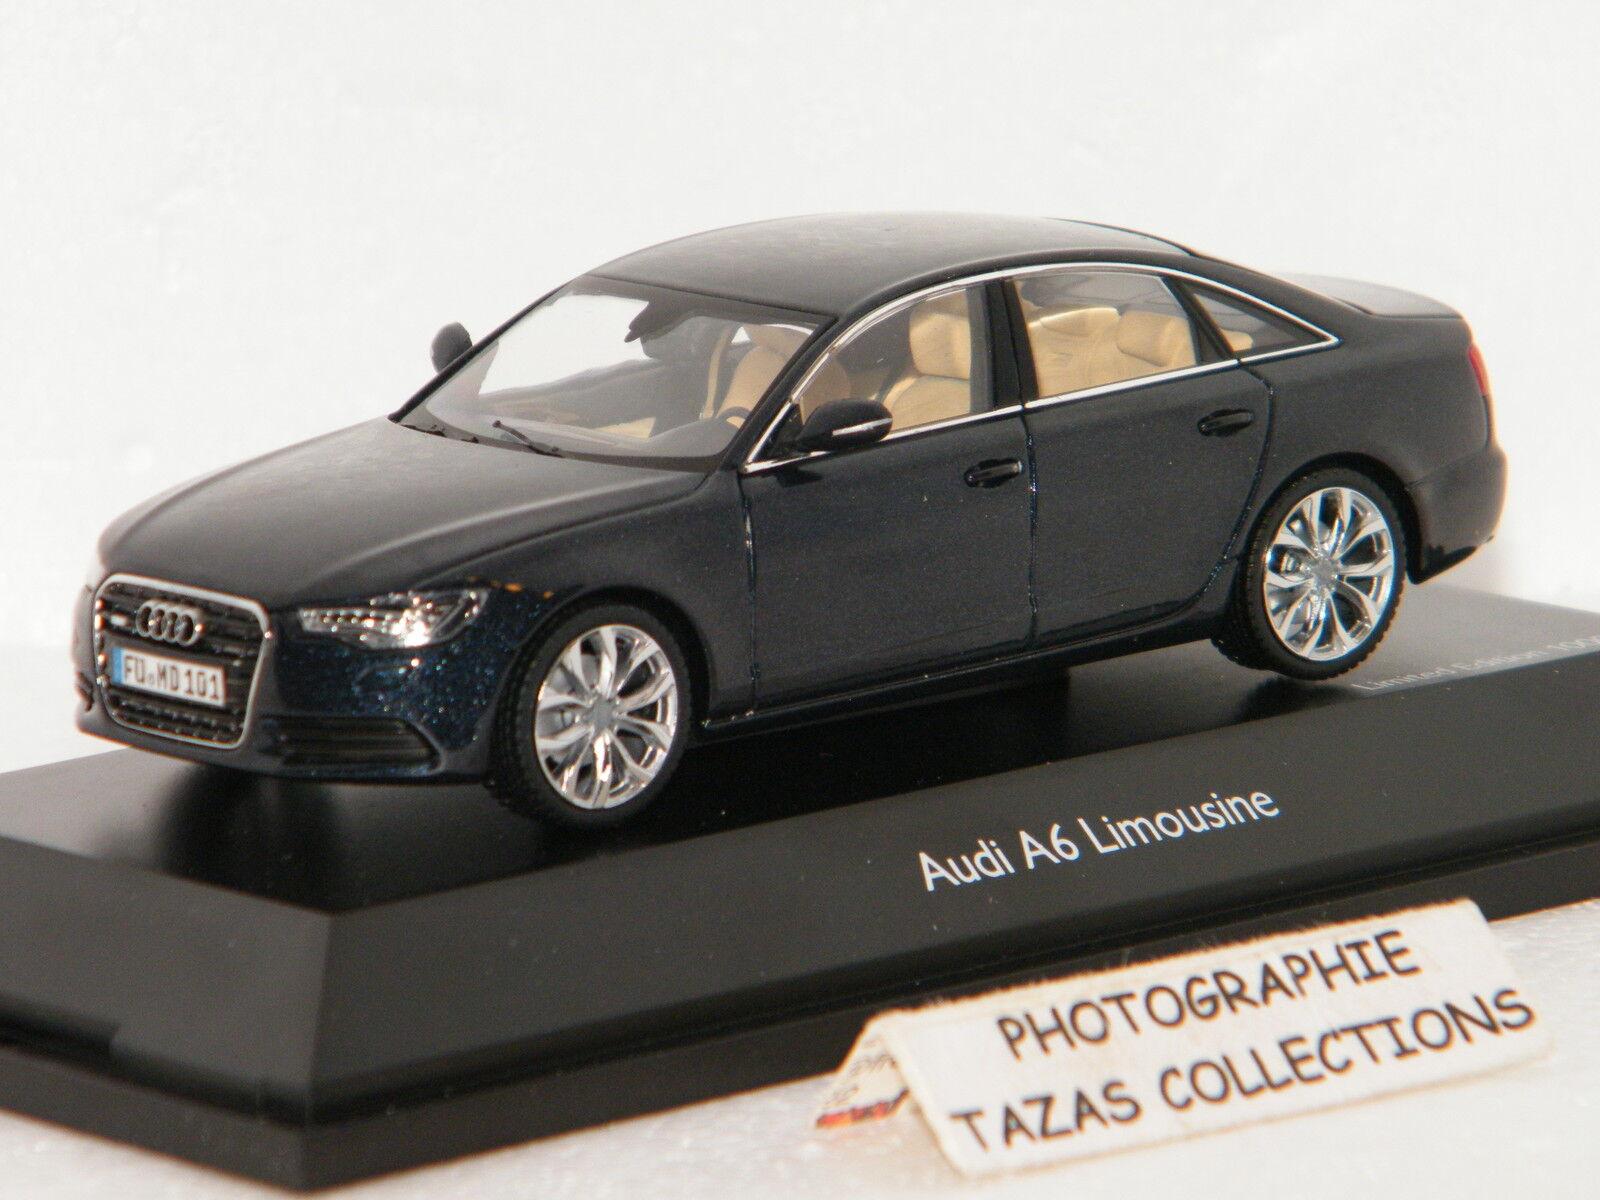 Audi a6 limousine mondscheinblue (bluee) schuco 1 43 ref 0748200